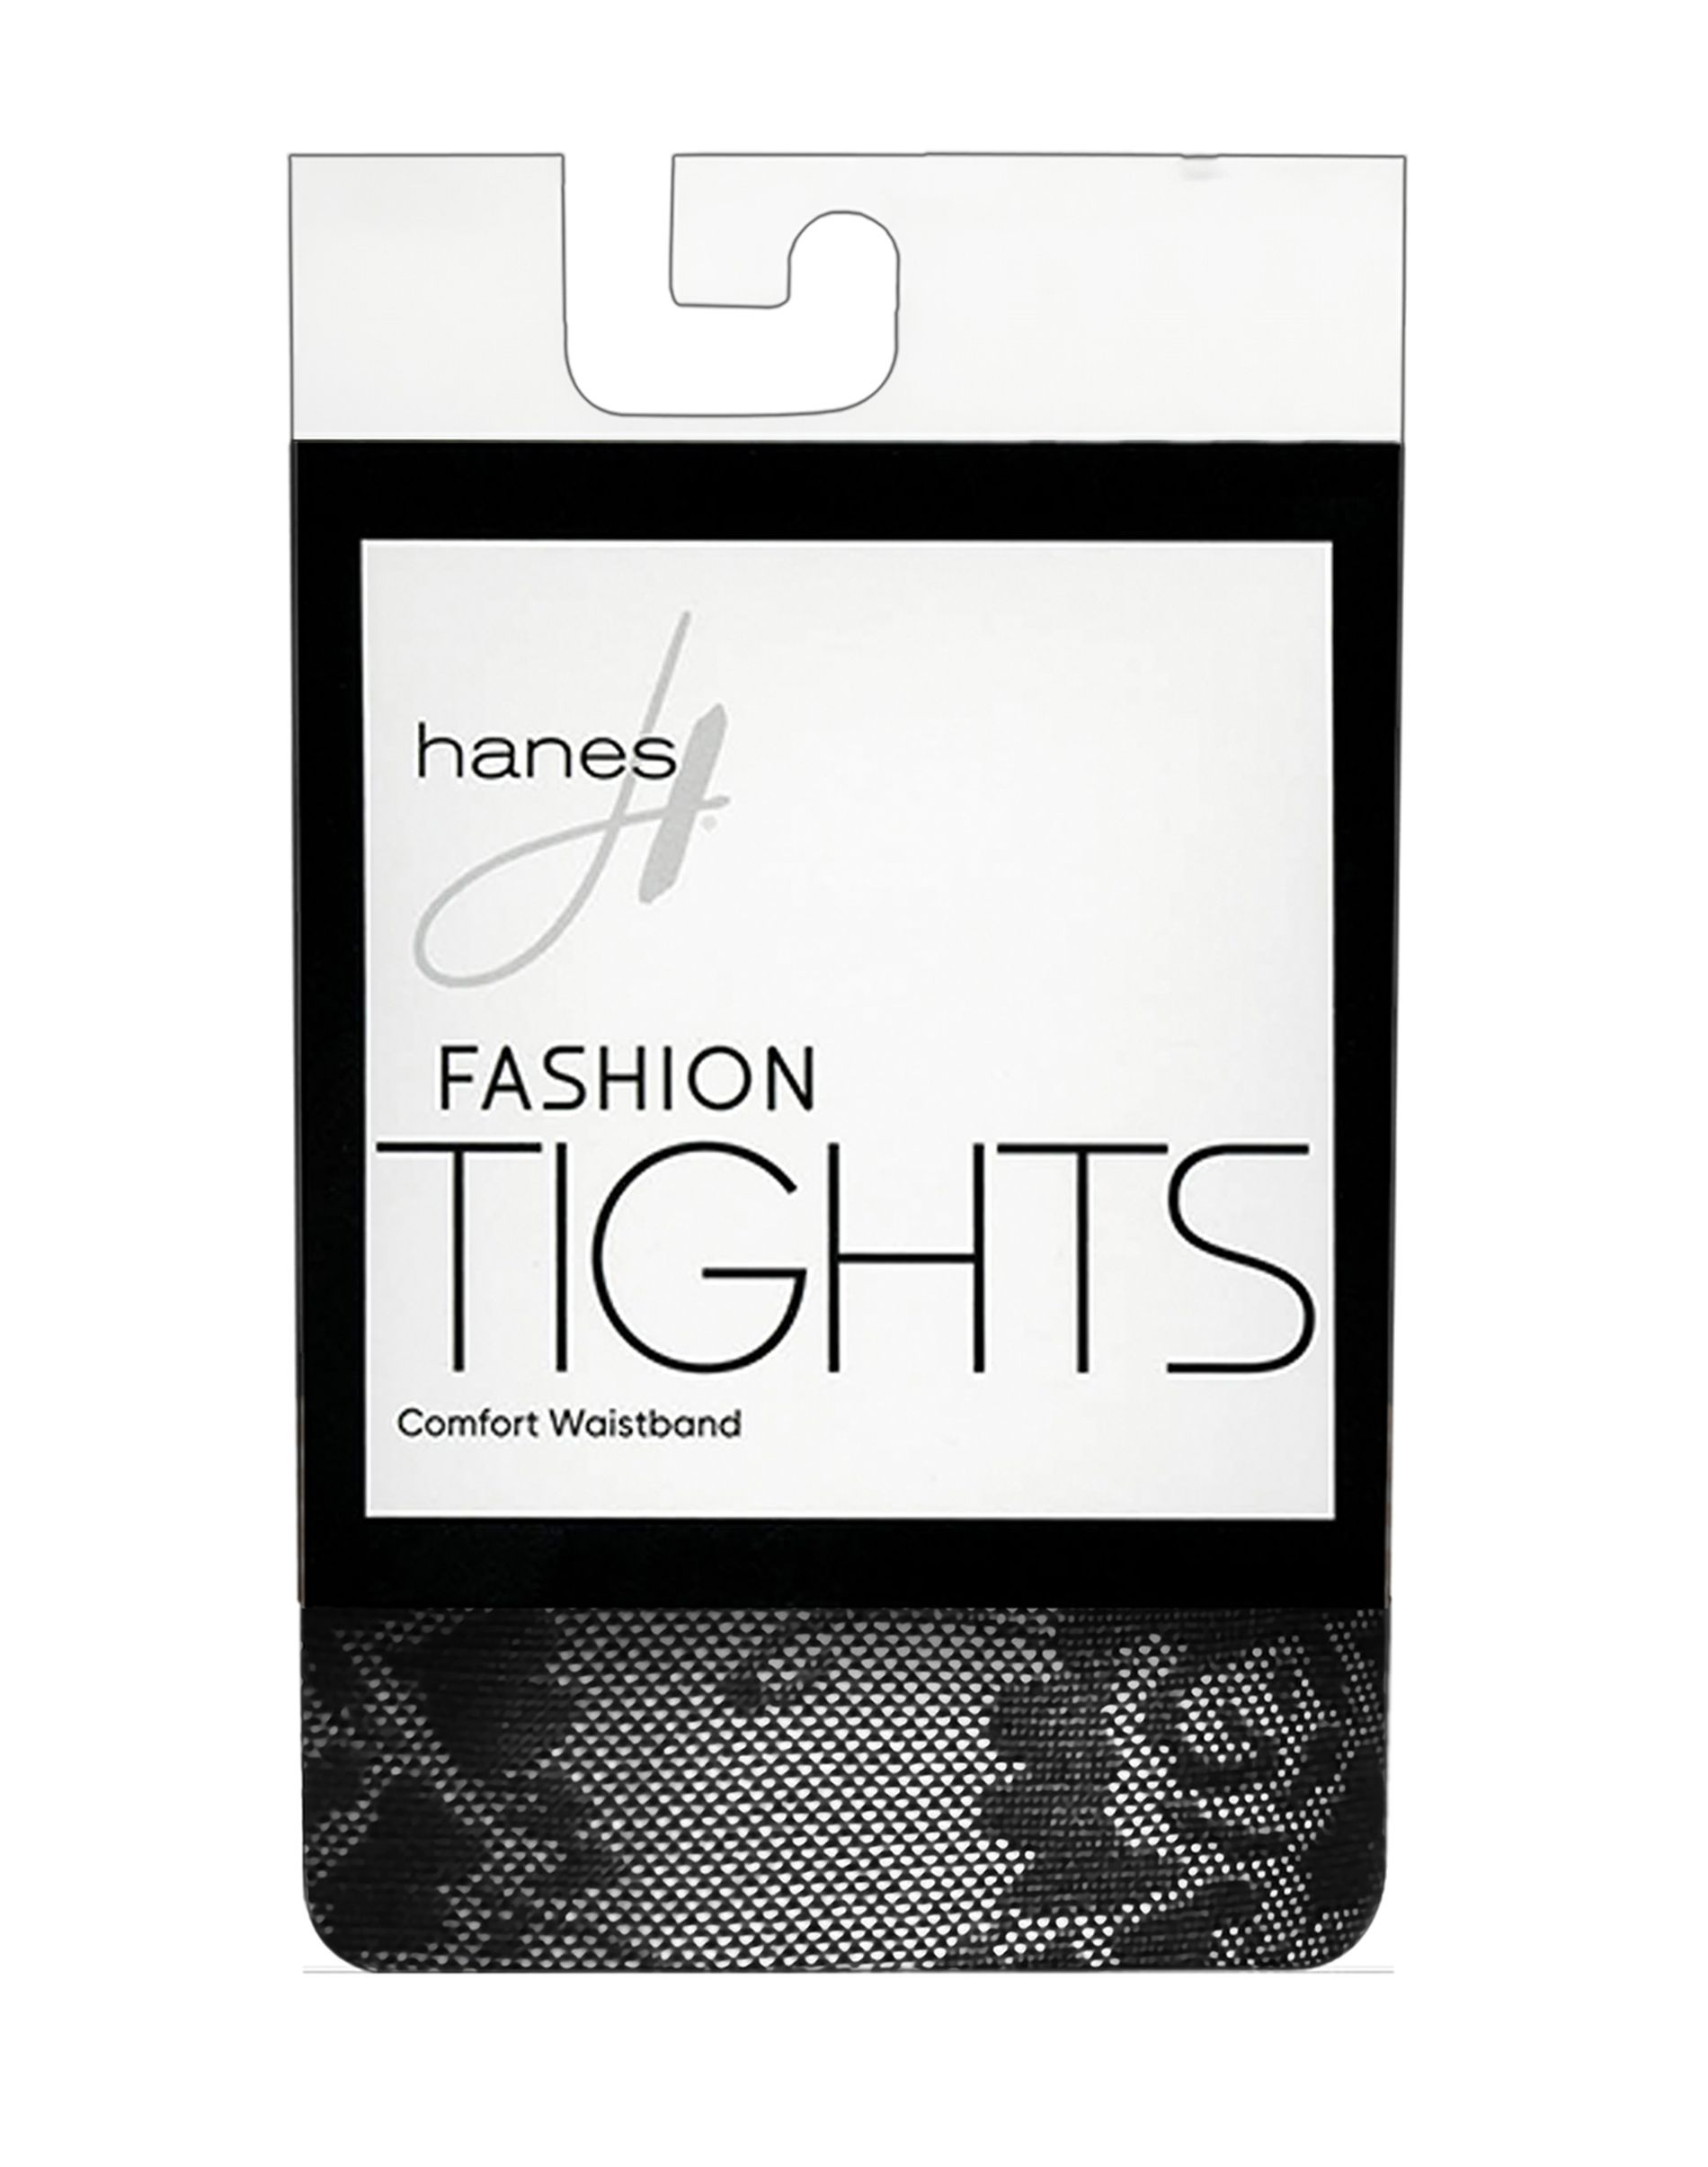 hanes floral lace control top fashion tights women Hanes